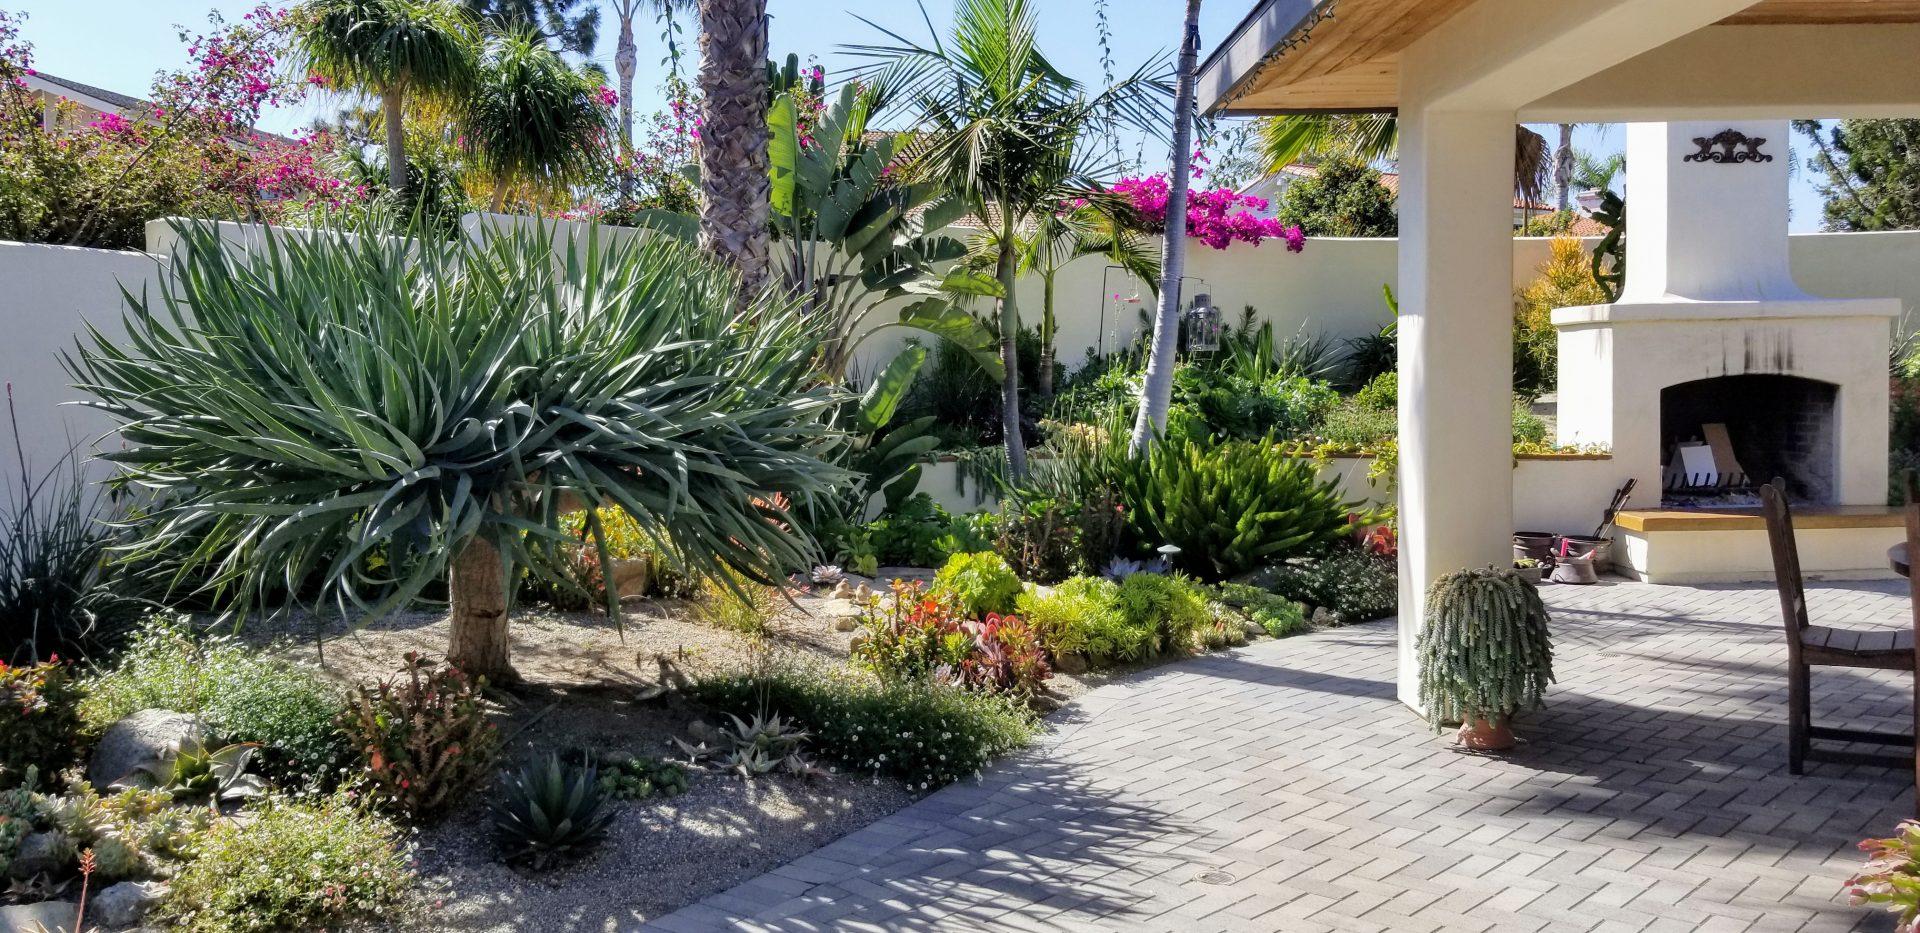 Carlsbad Water Efficient Garden Wins Omwd S Landscape